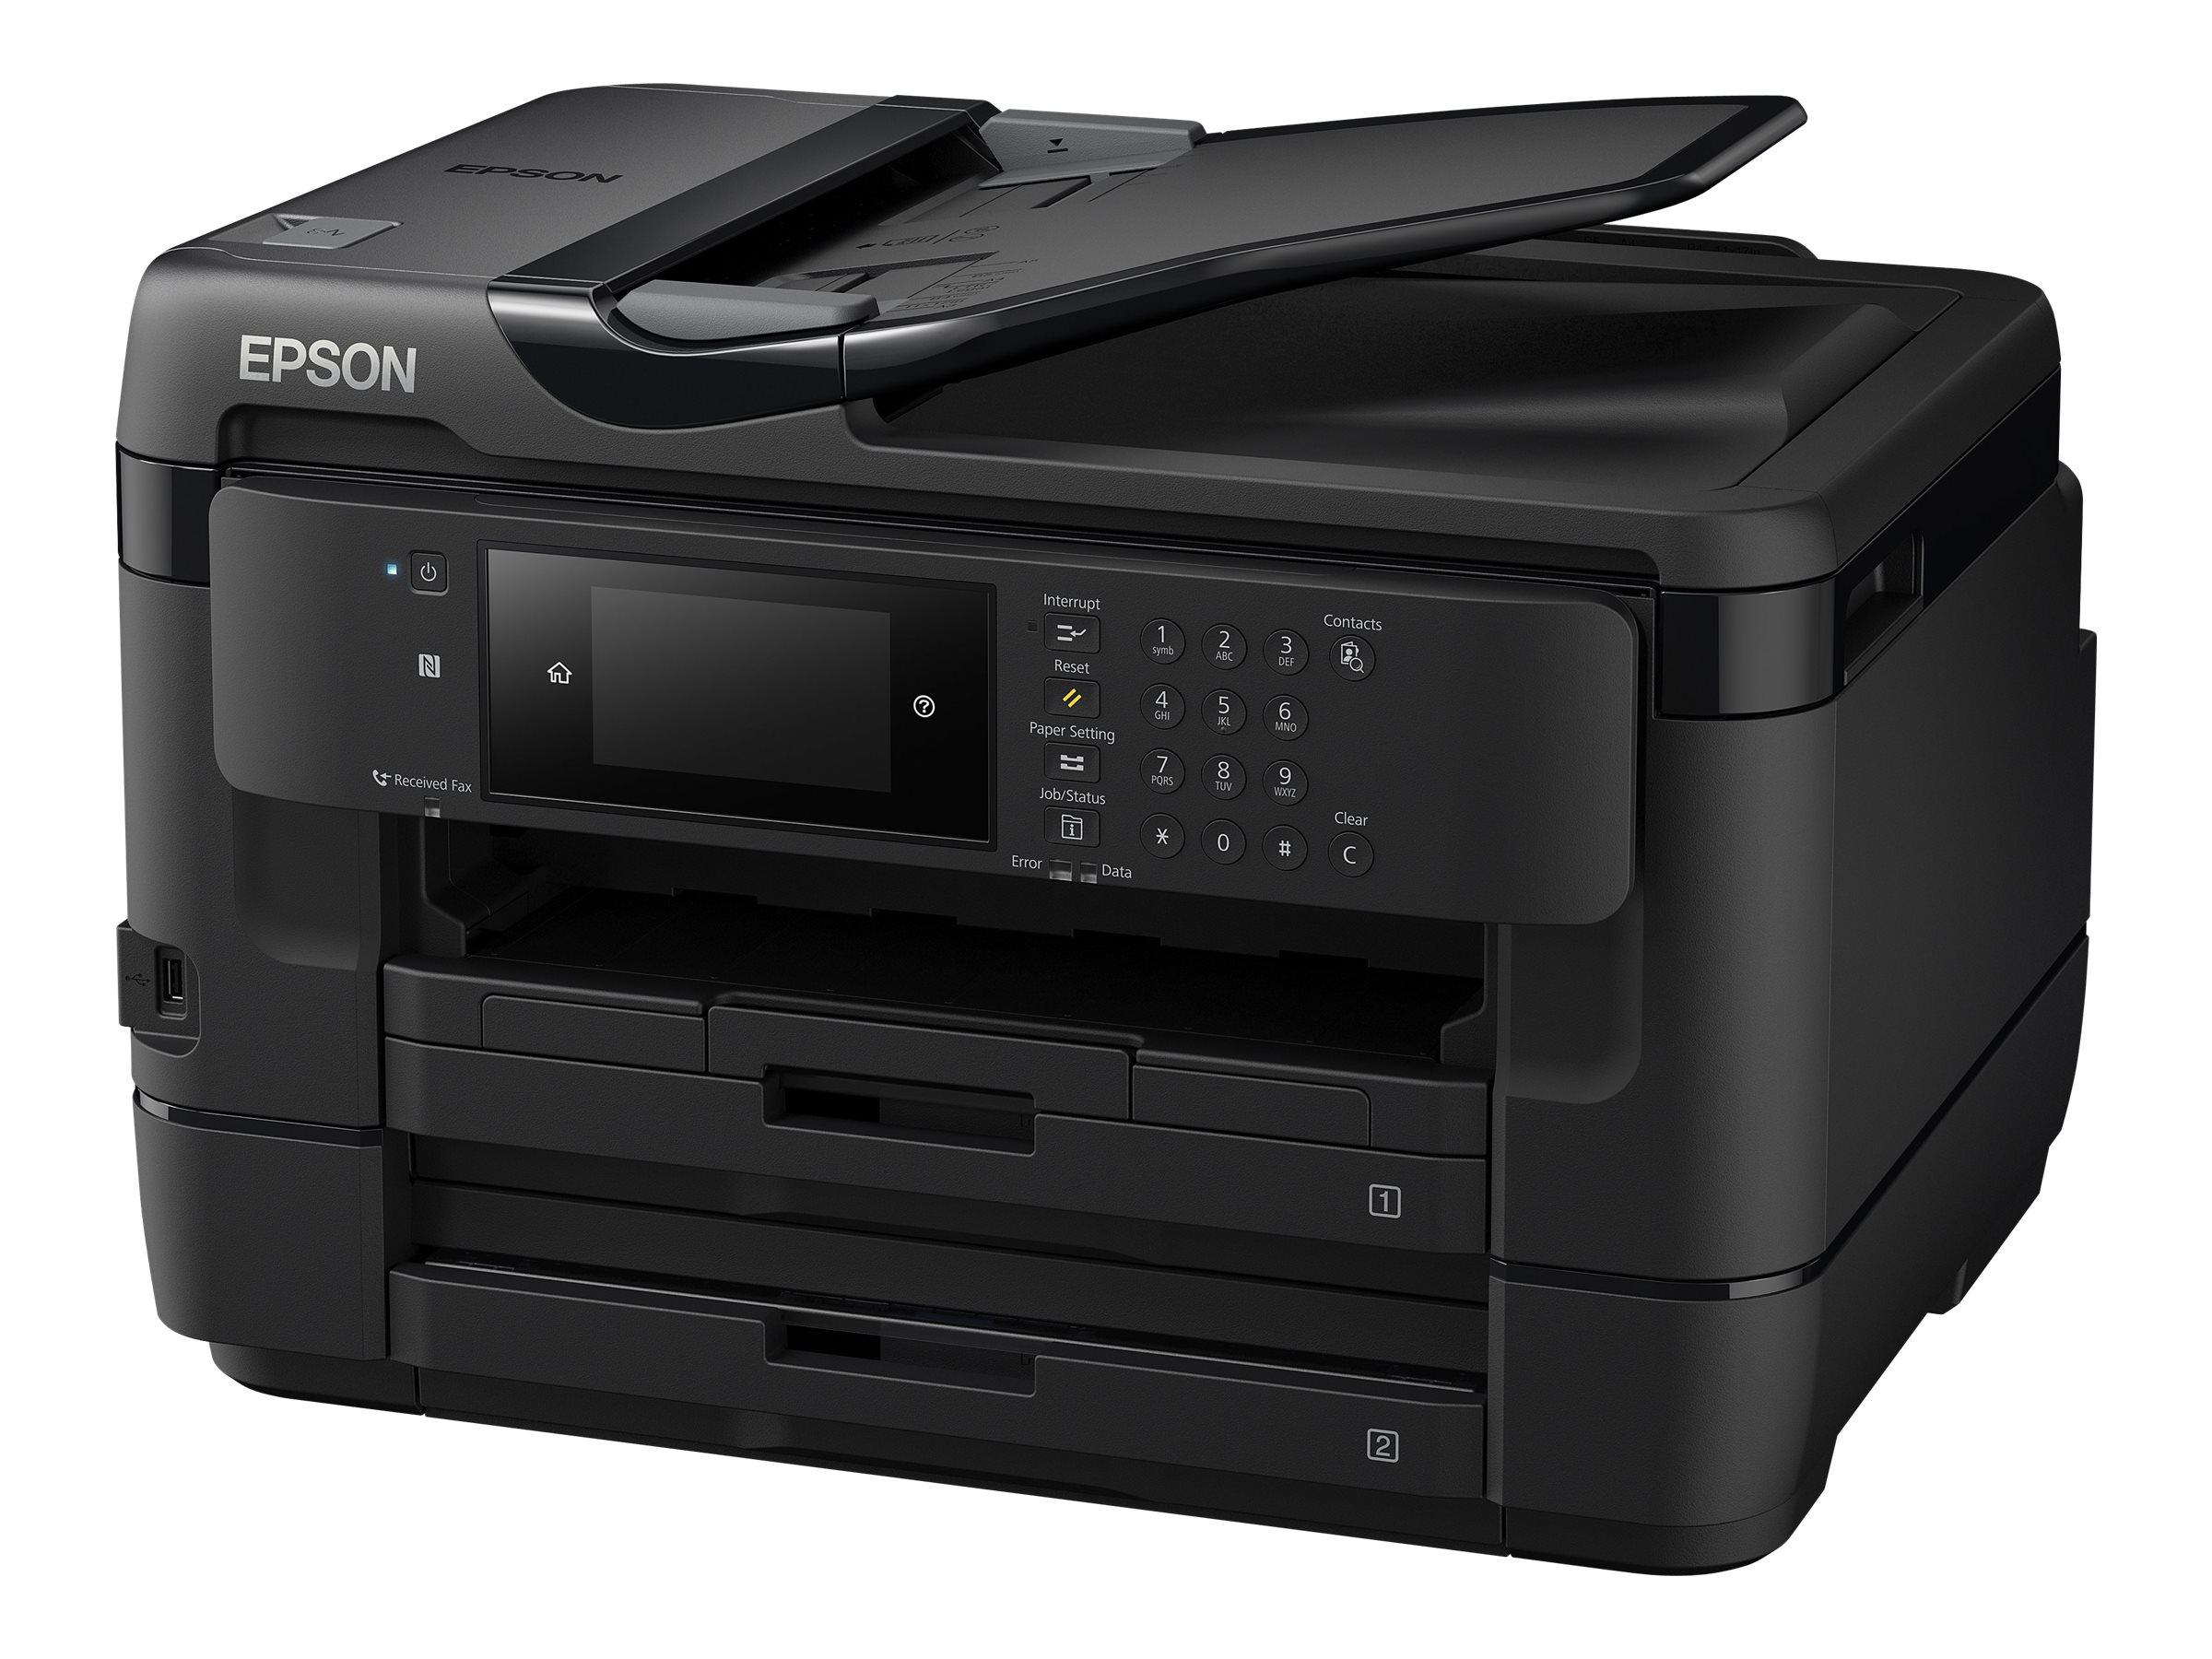 Epson WorkForce WF-7720DTWF - Multifunktionsdrucker - Farbe - Tintenstrahl - A3 (Medien)